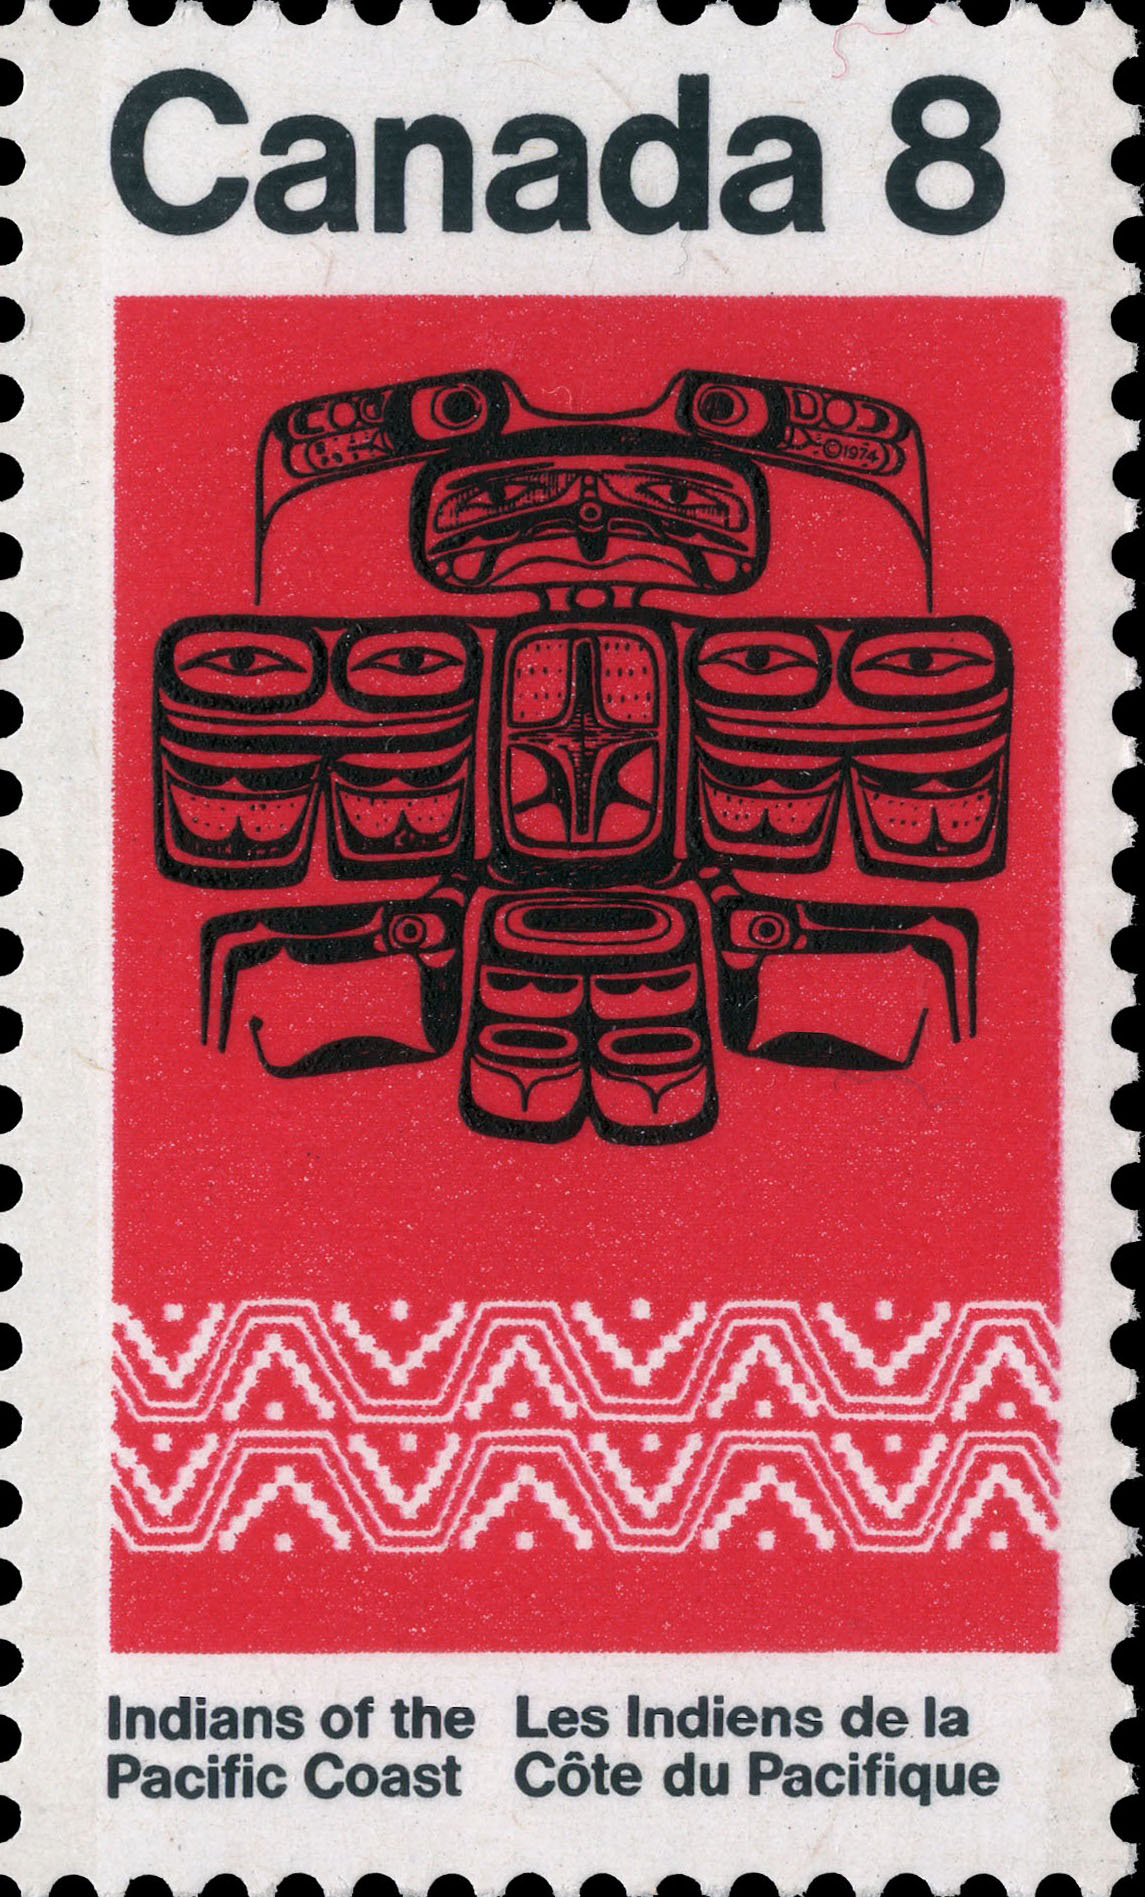 Thunderbird Canada Postage Stamp